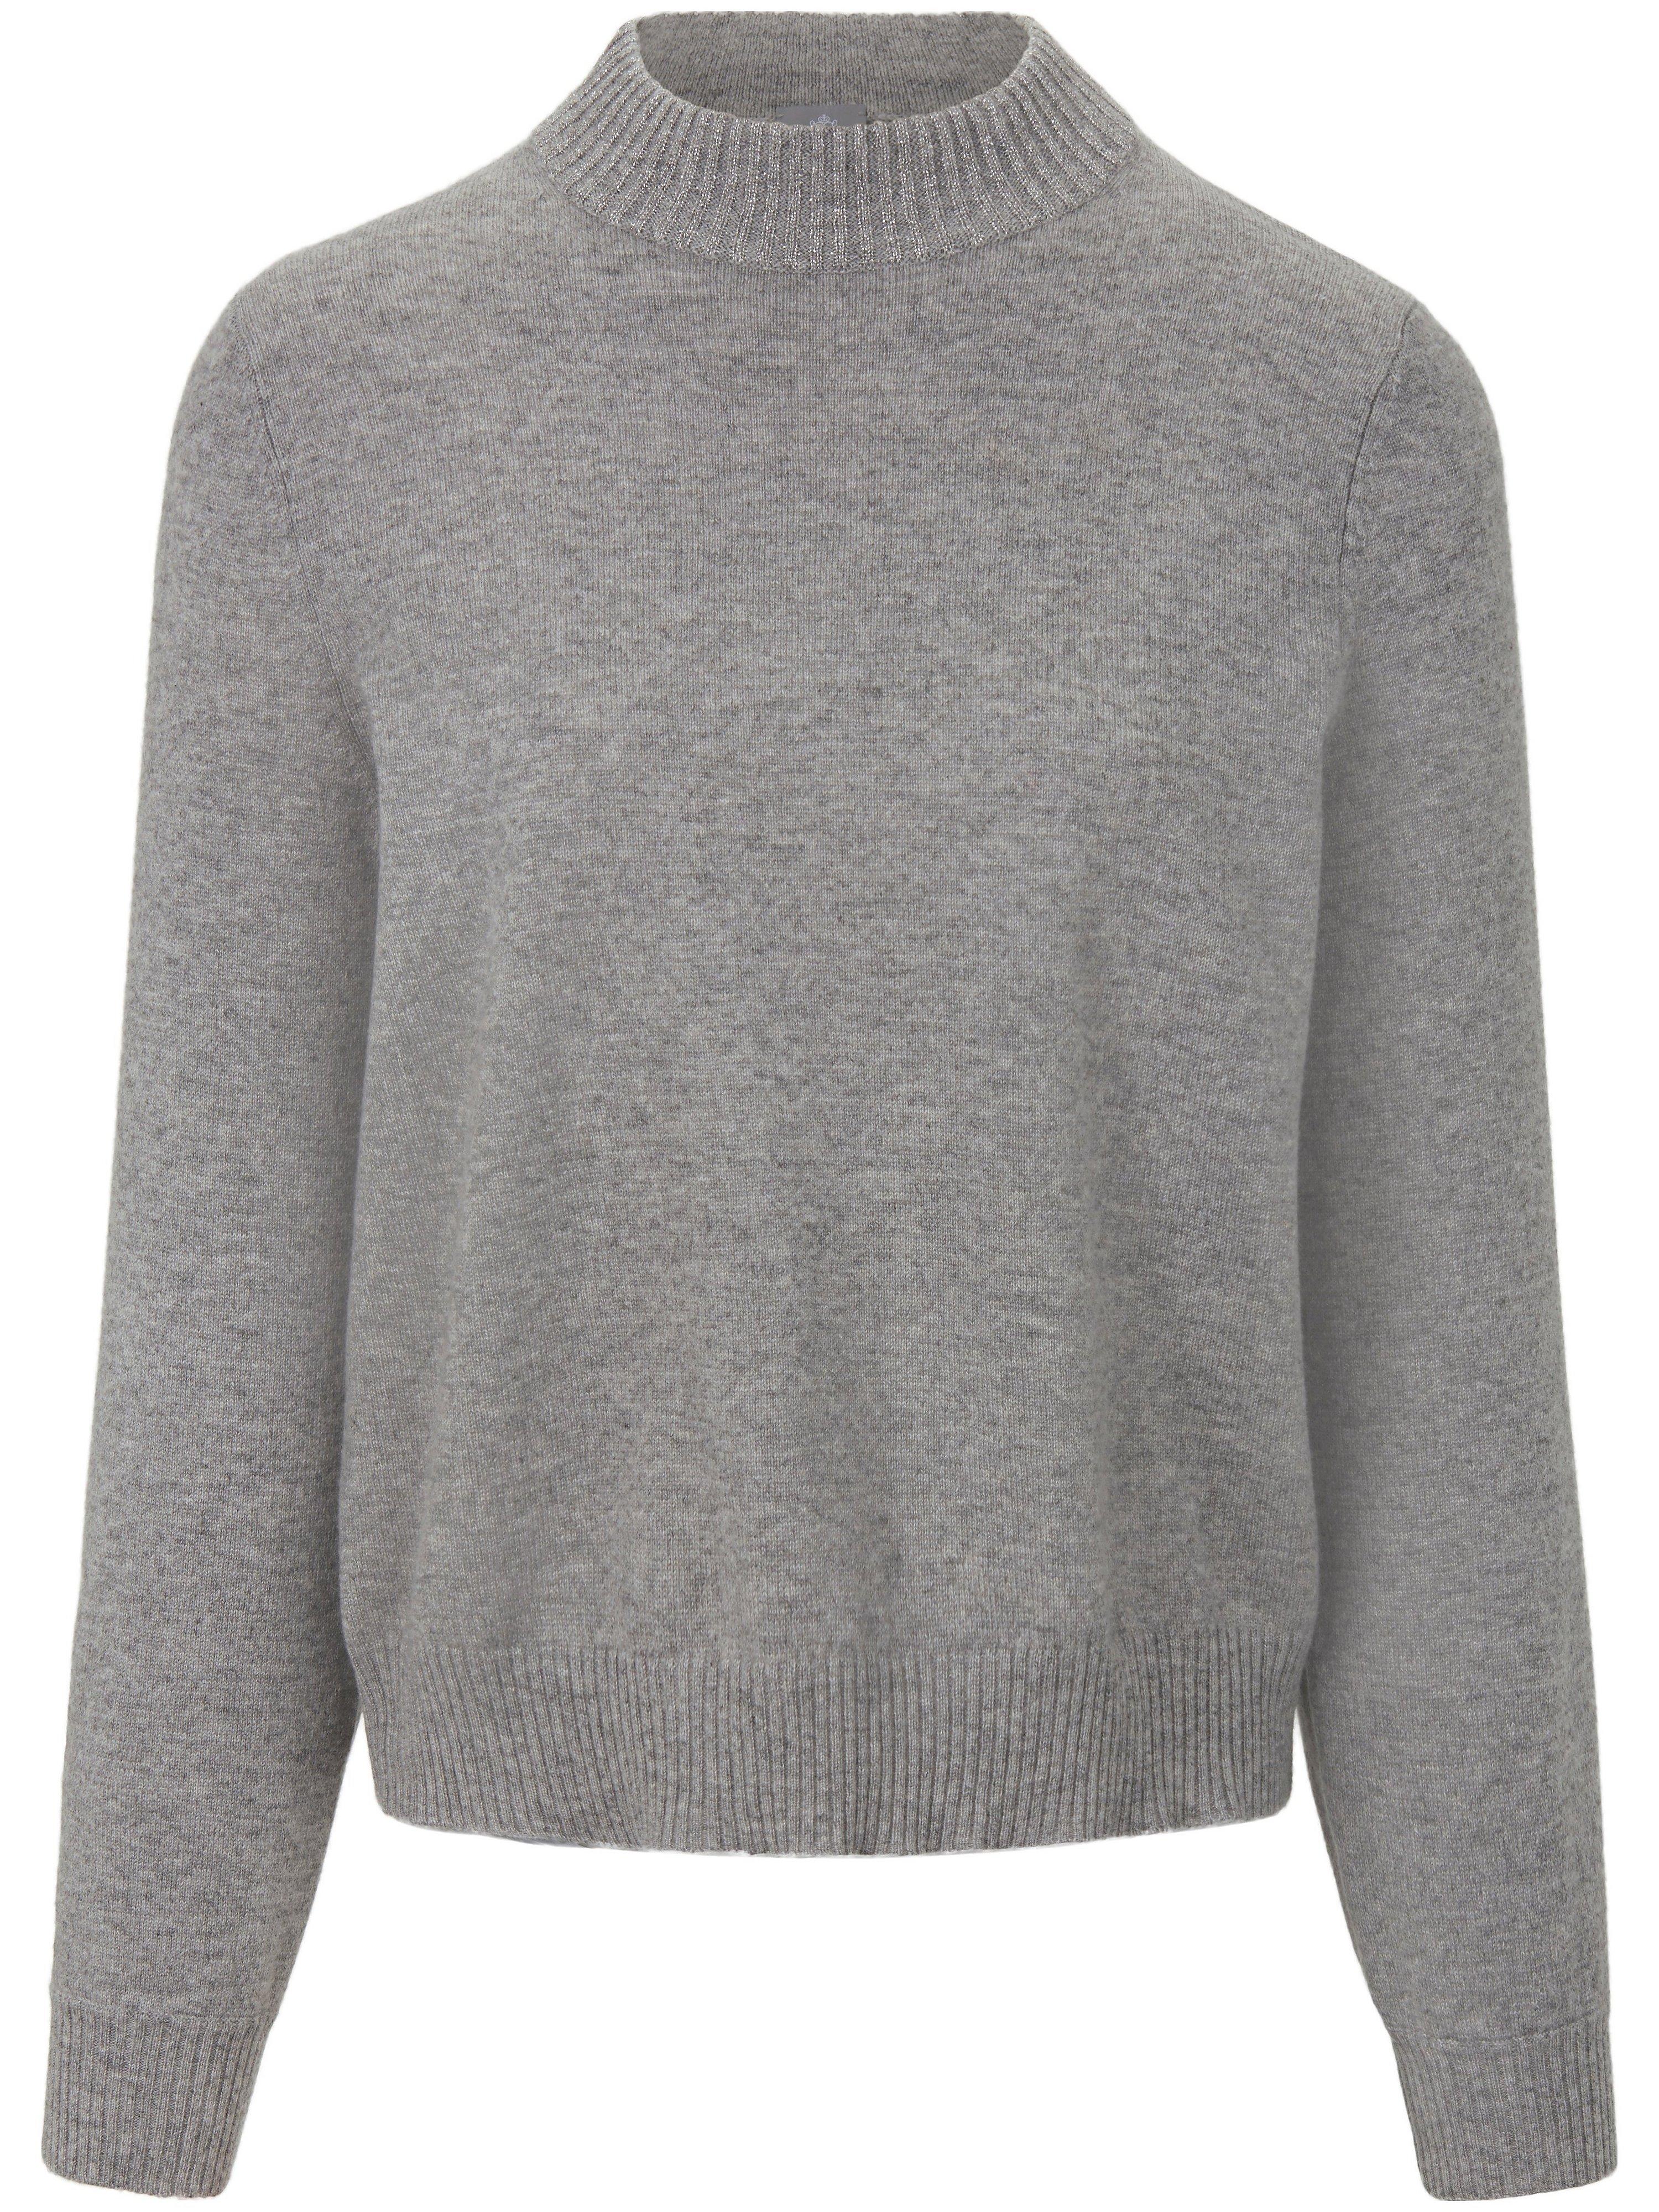 Le pull 100% cachemire  FTC Cashmere gris taille 44